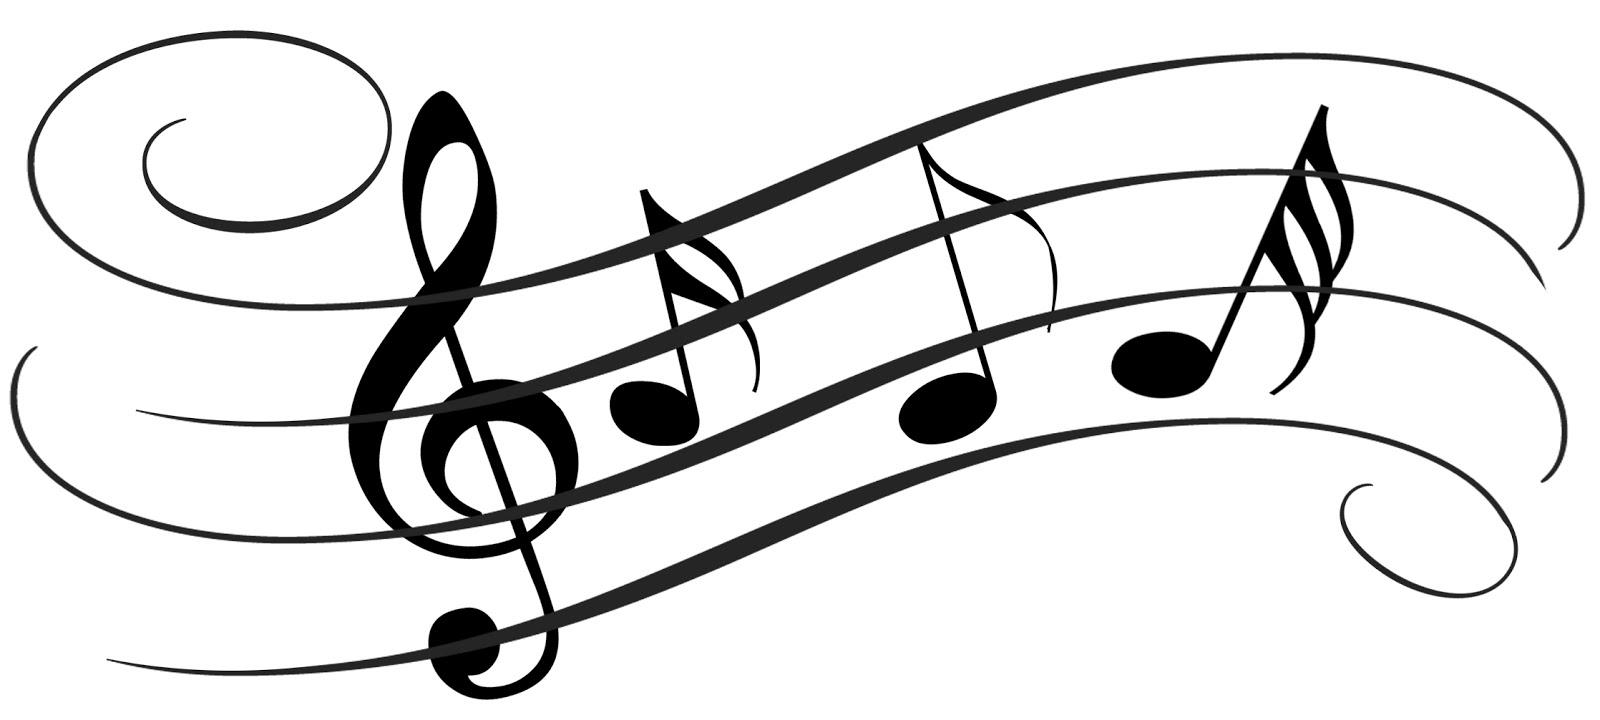 Flutes clipart music classroom. Class free download best